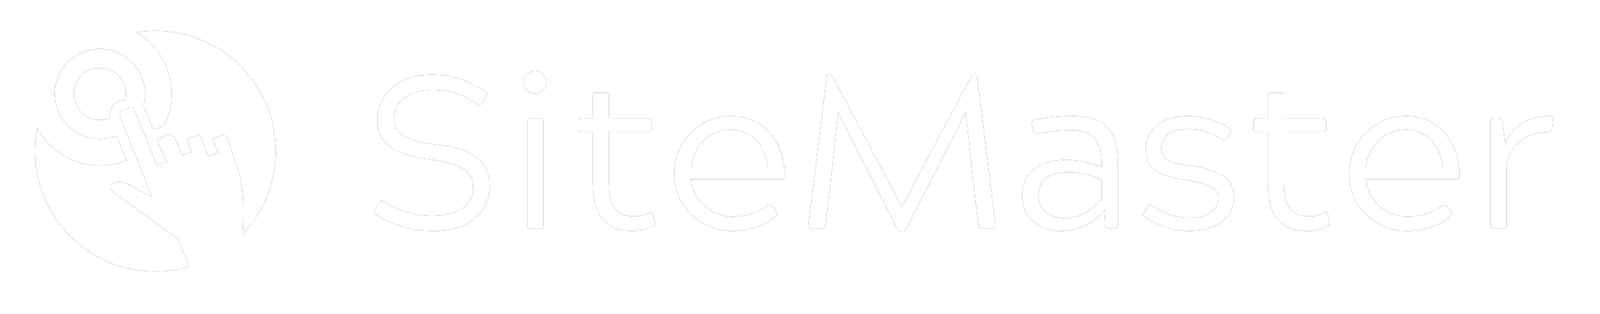 SiteMaster - קידום אתרים SEO